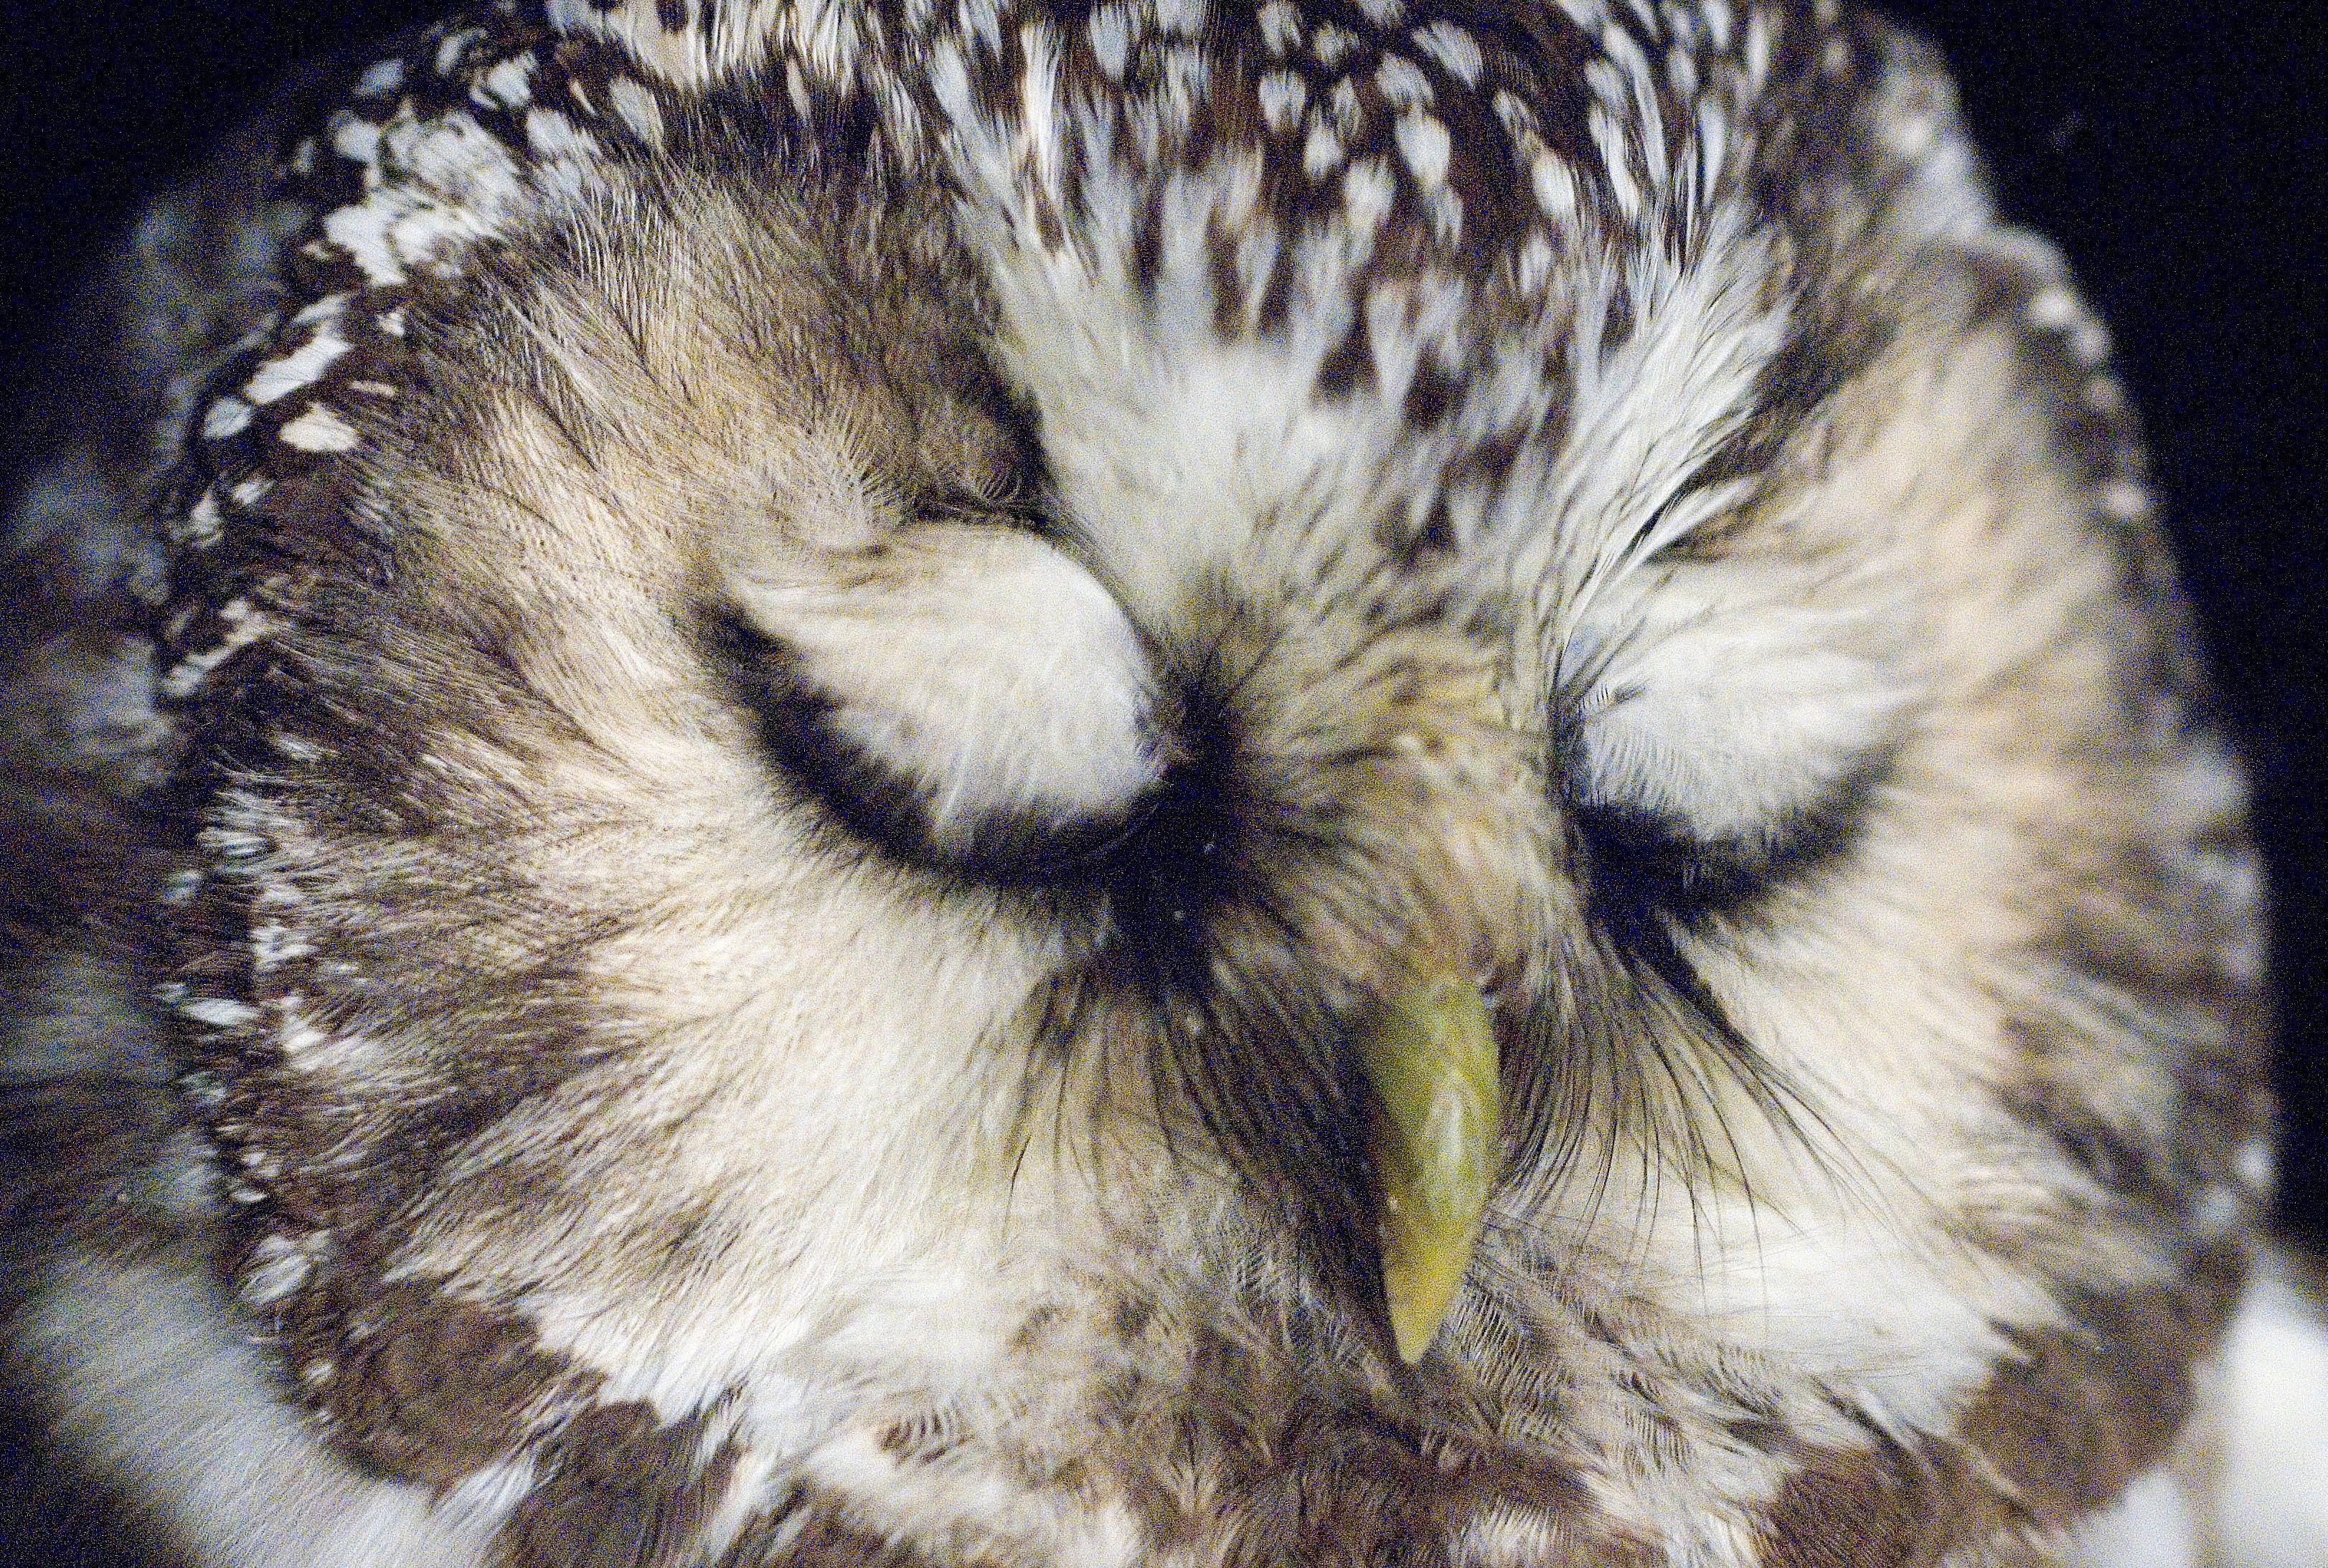 A sleepy owl